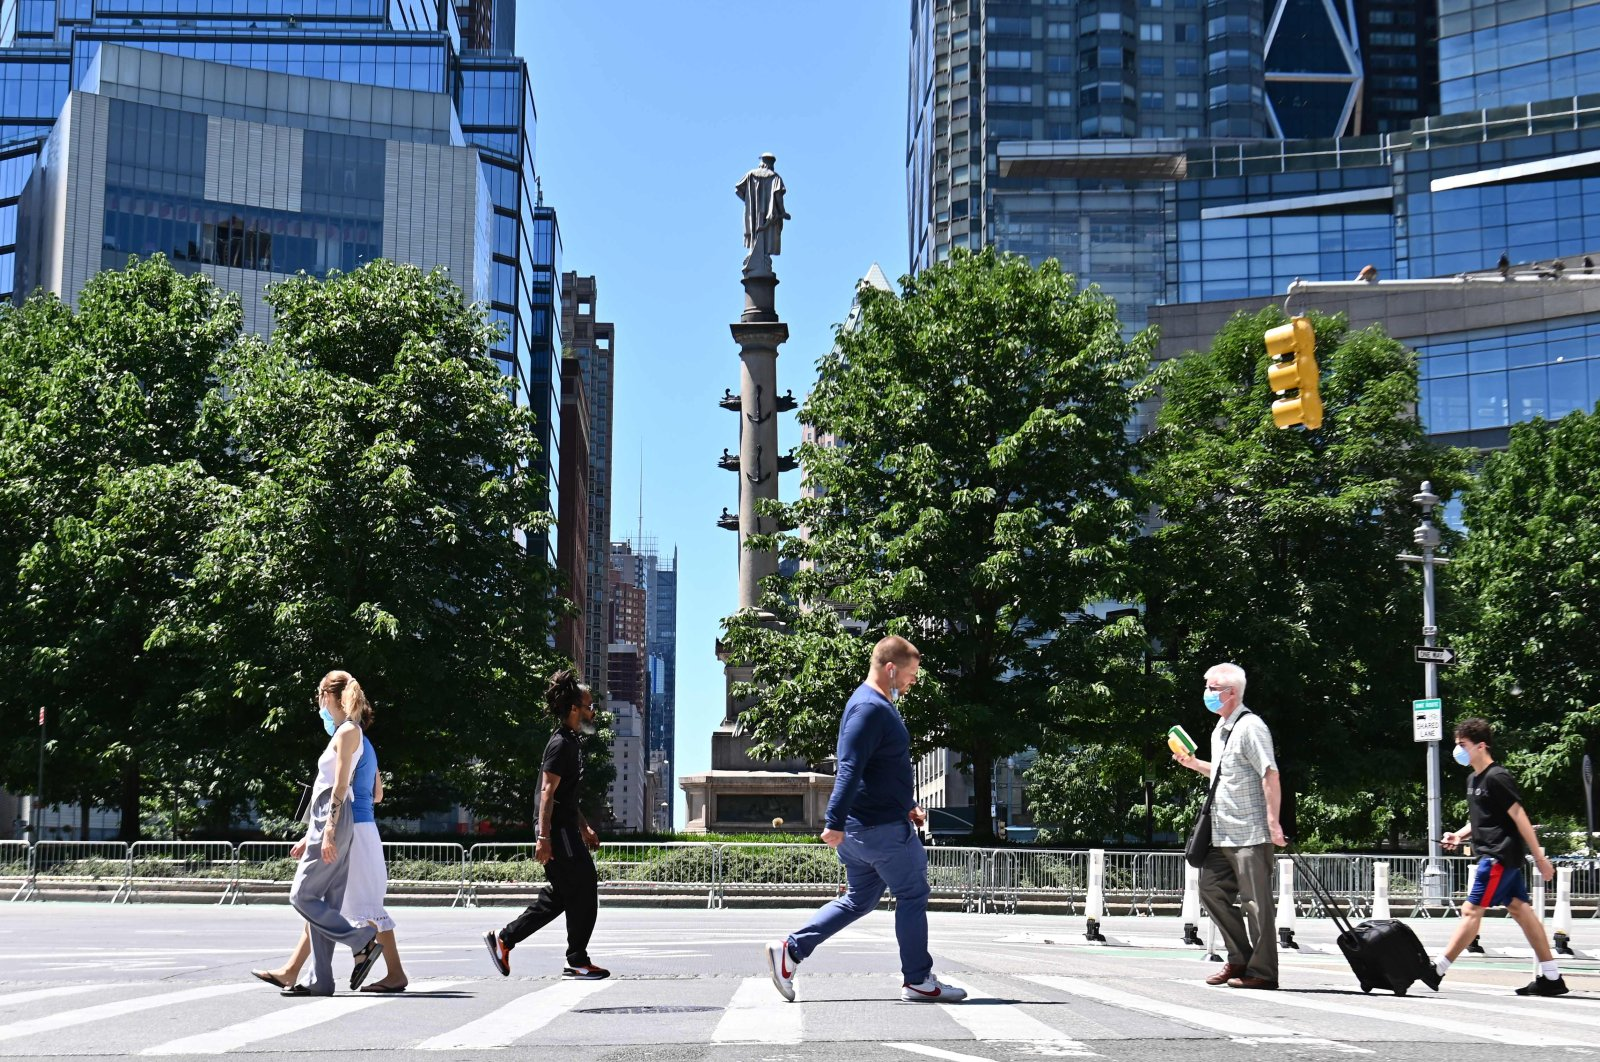 People walk around Columbus Circle in New York, June 12, 2020. (AFP Photo)